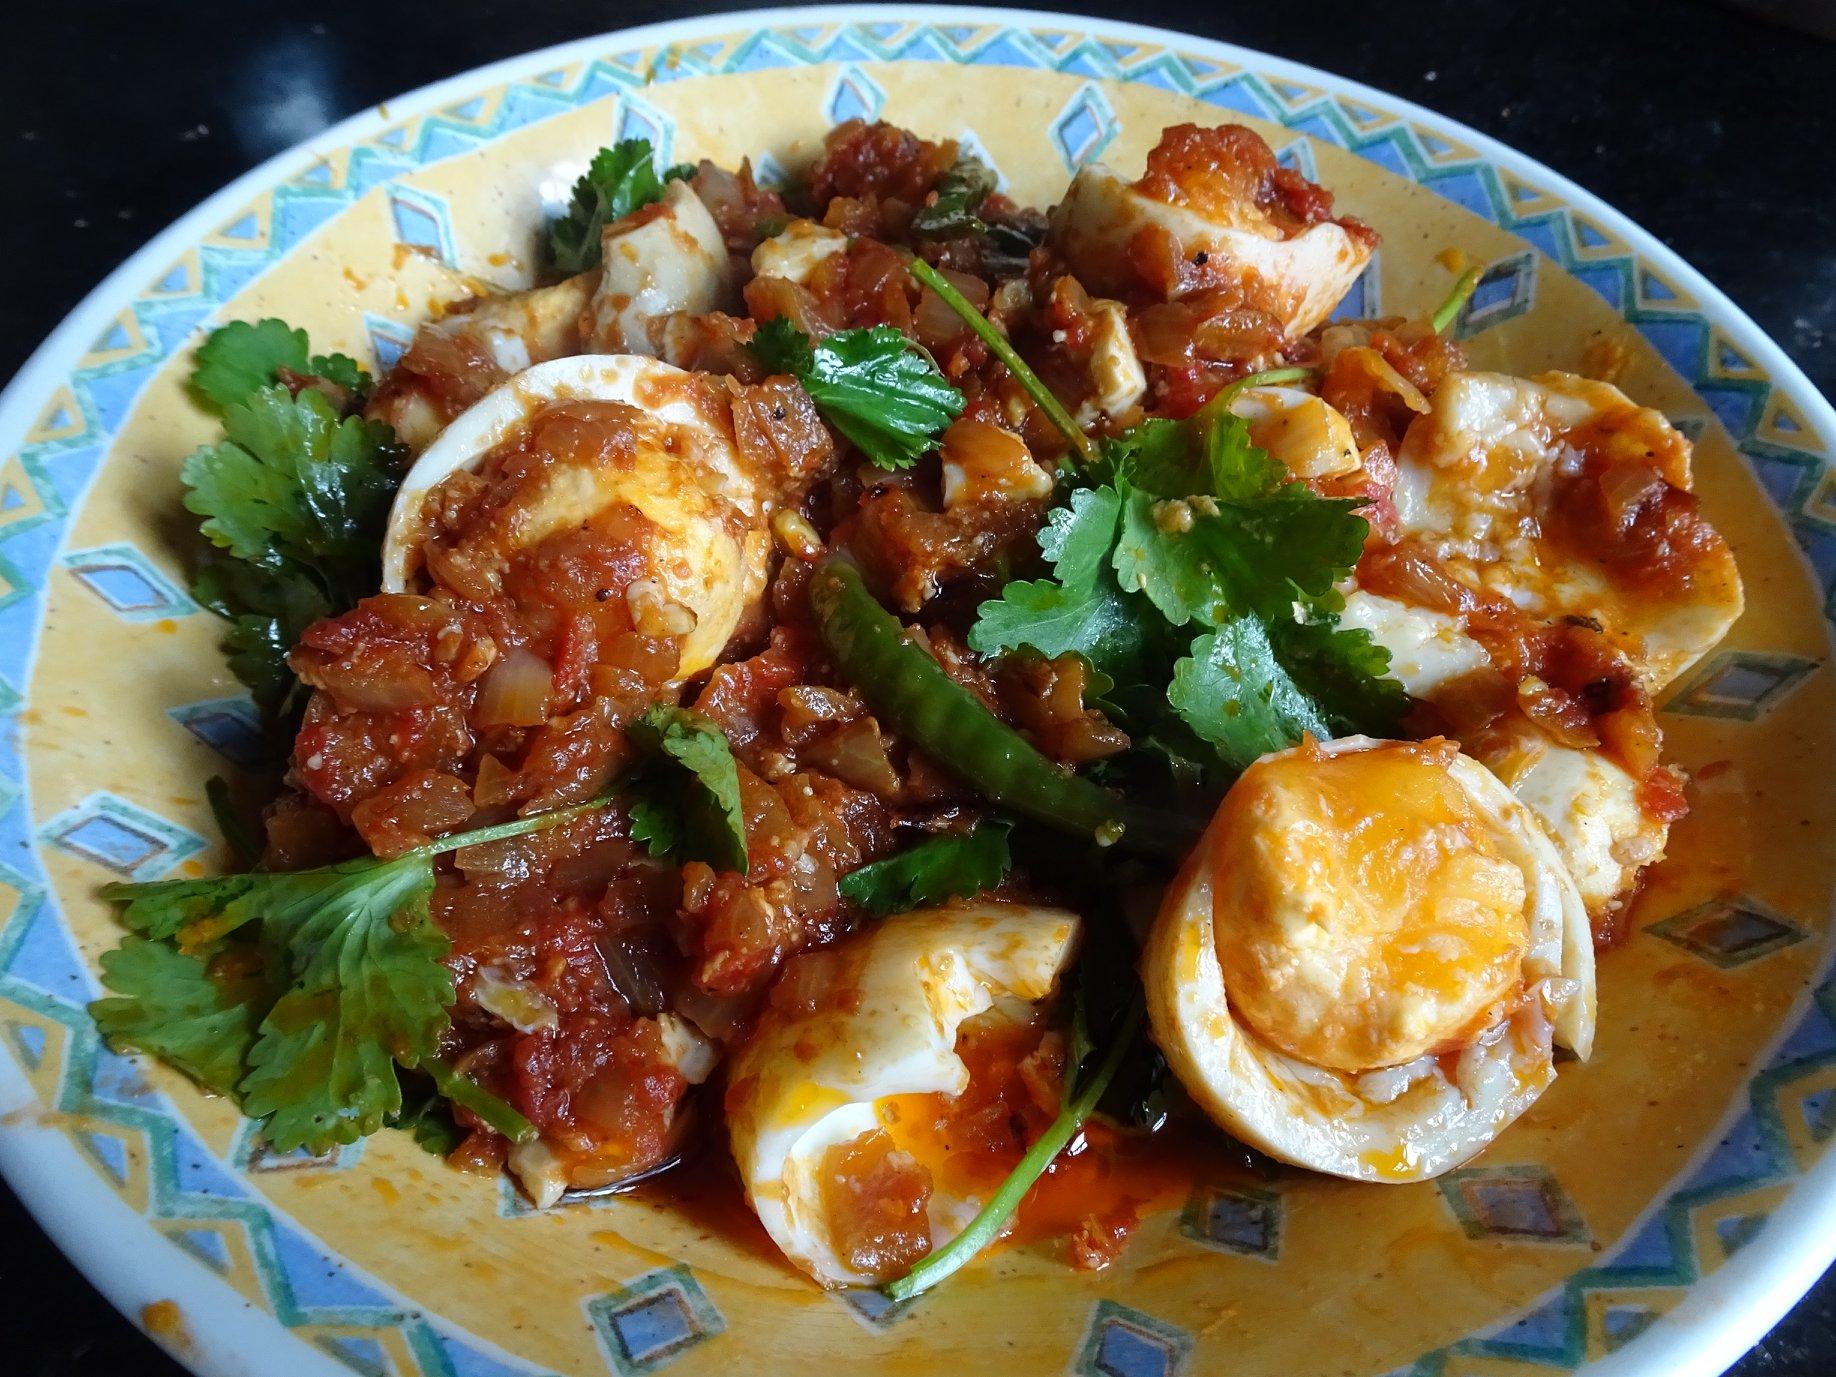 meemalee_Burmese Egg Curry 1.jpg